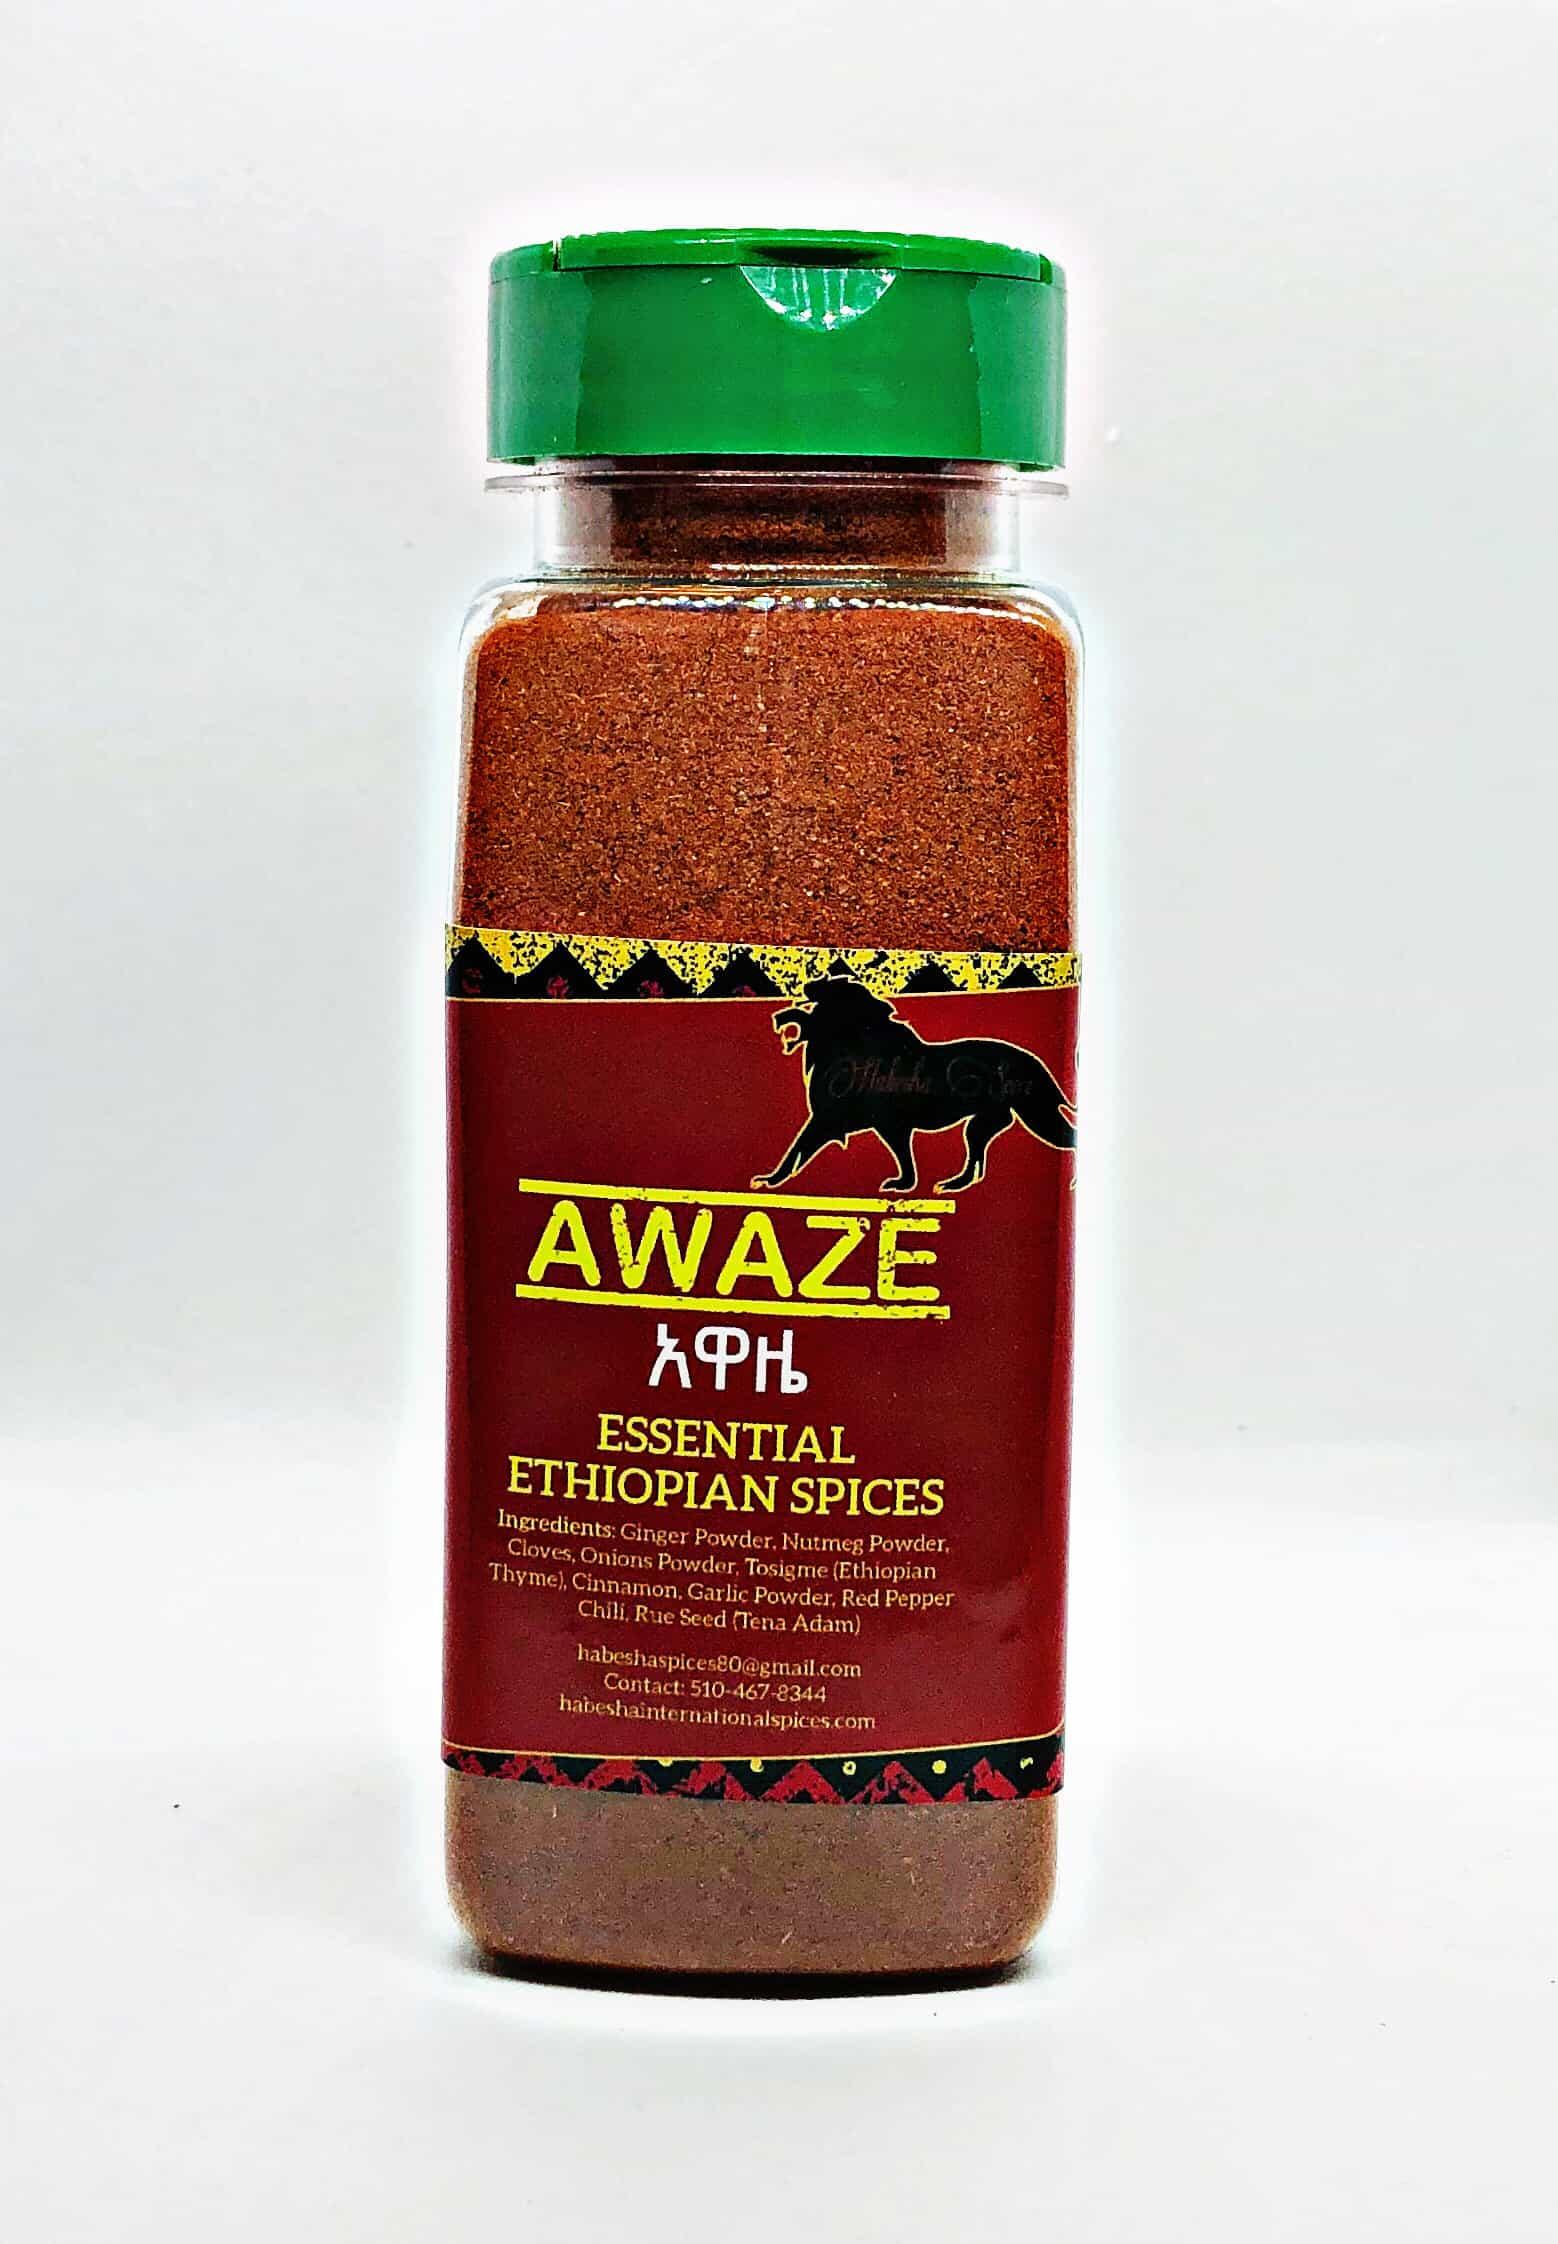 Awaze Product Image